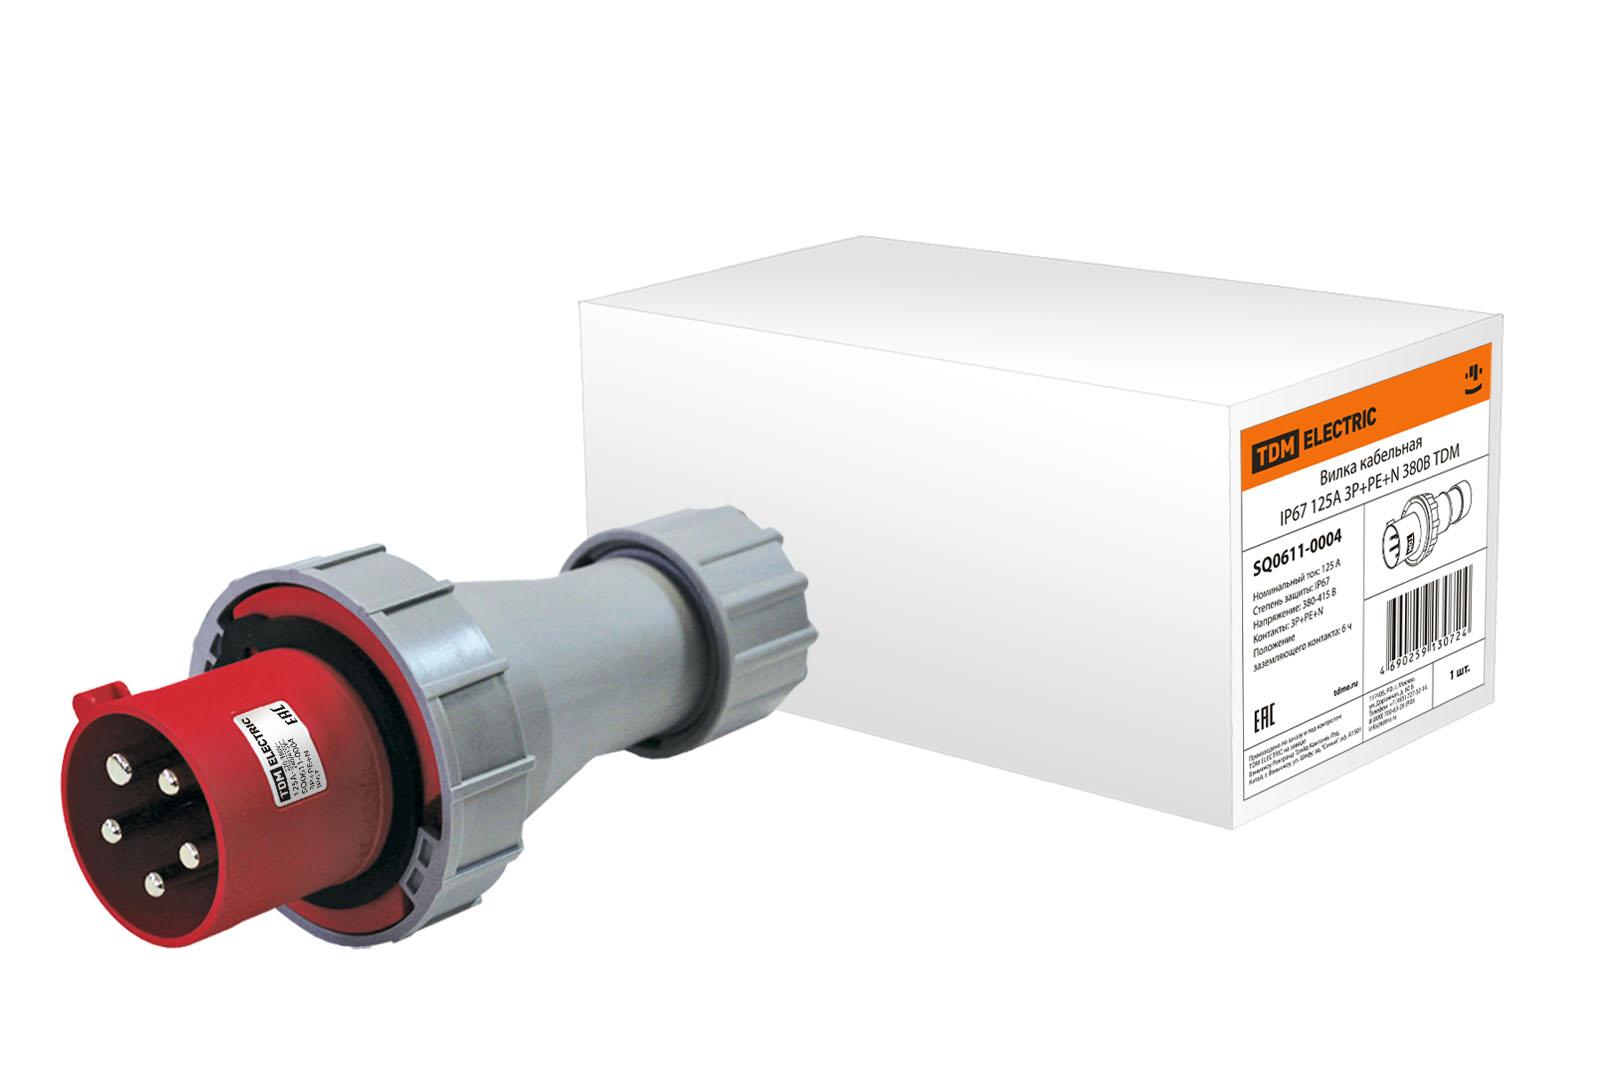 Вилка кабельная ТДМ Sq0611-0004